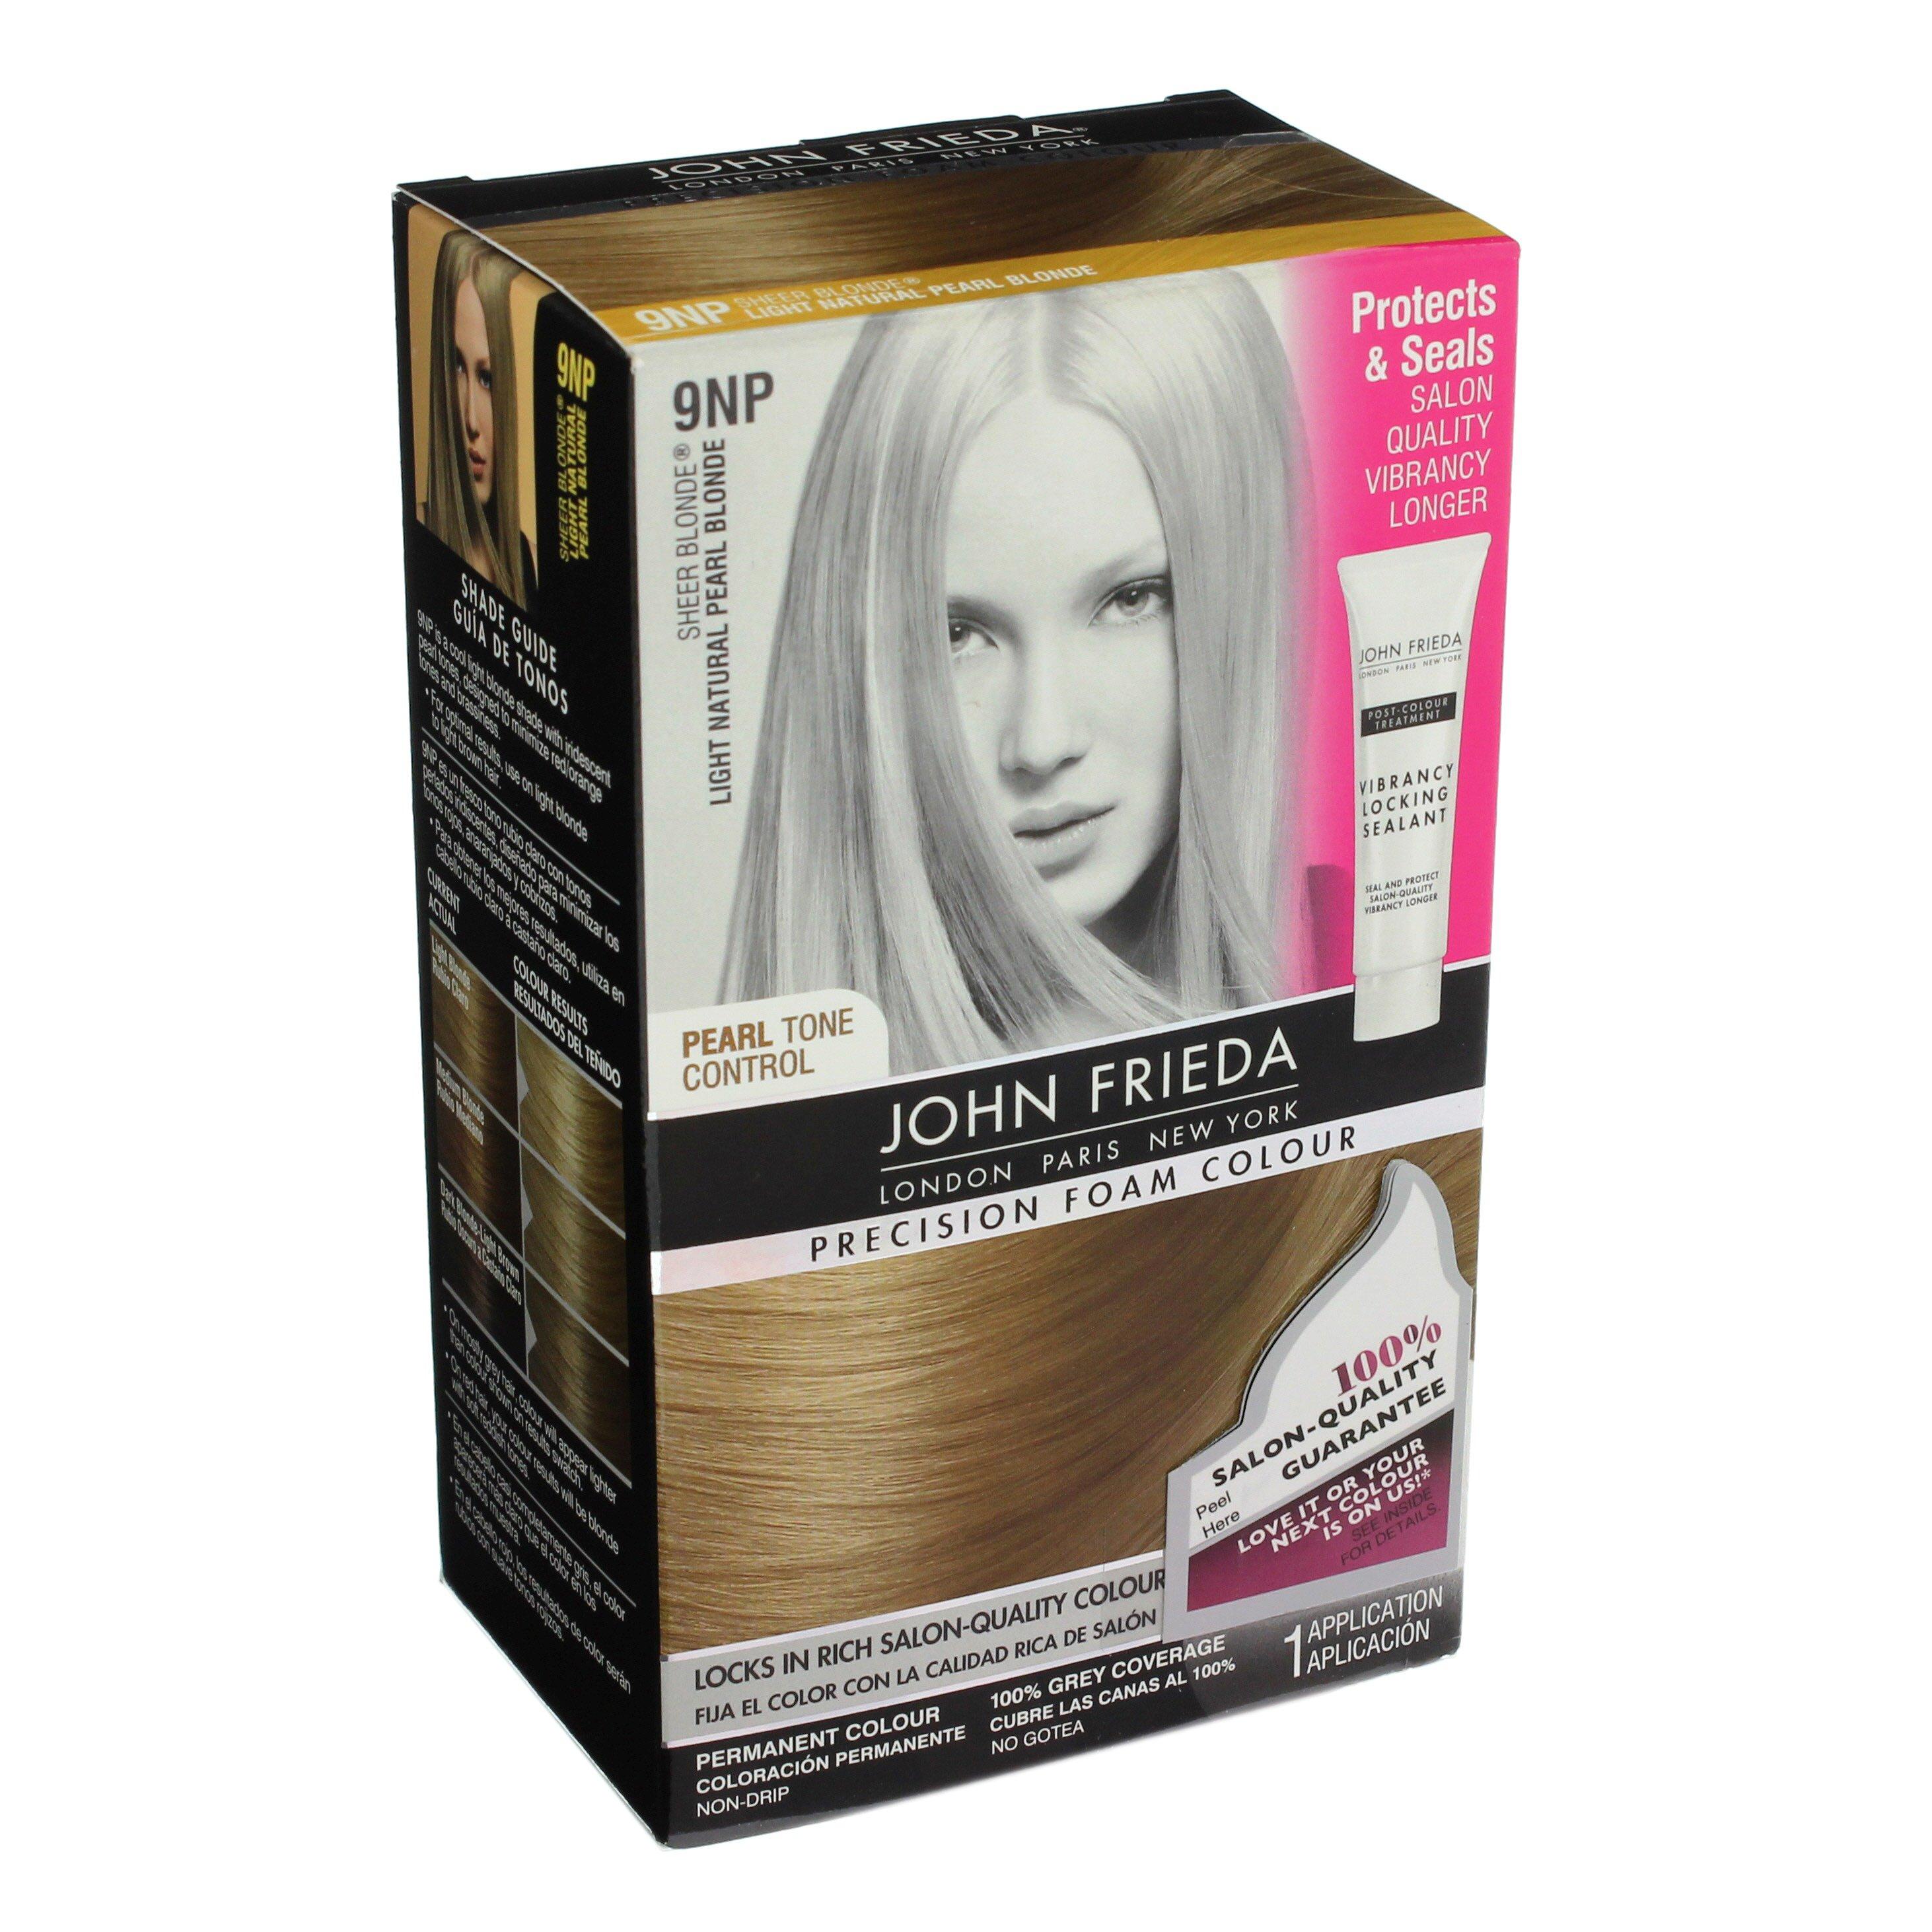 John Frieda Precision Foam Colour 9np Light Natural Pearl Blonde